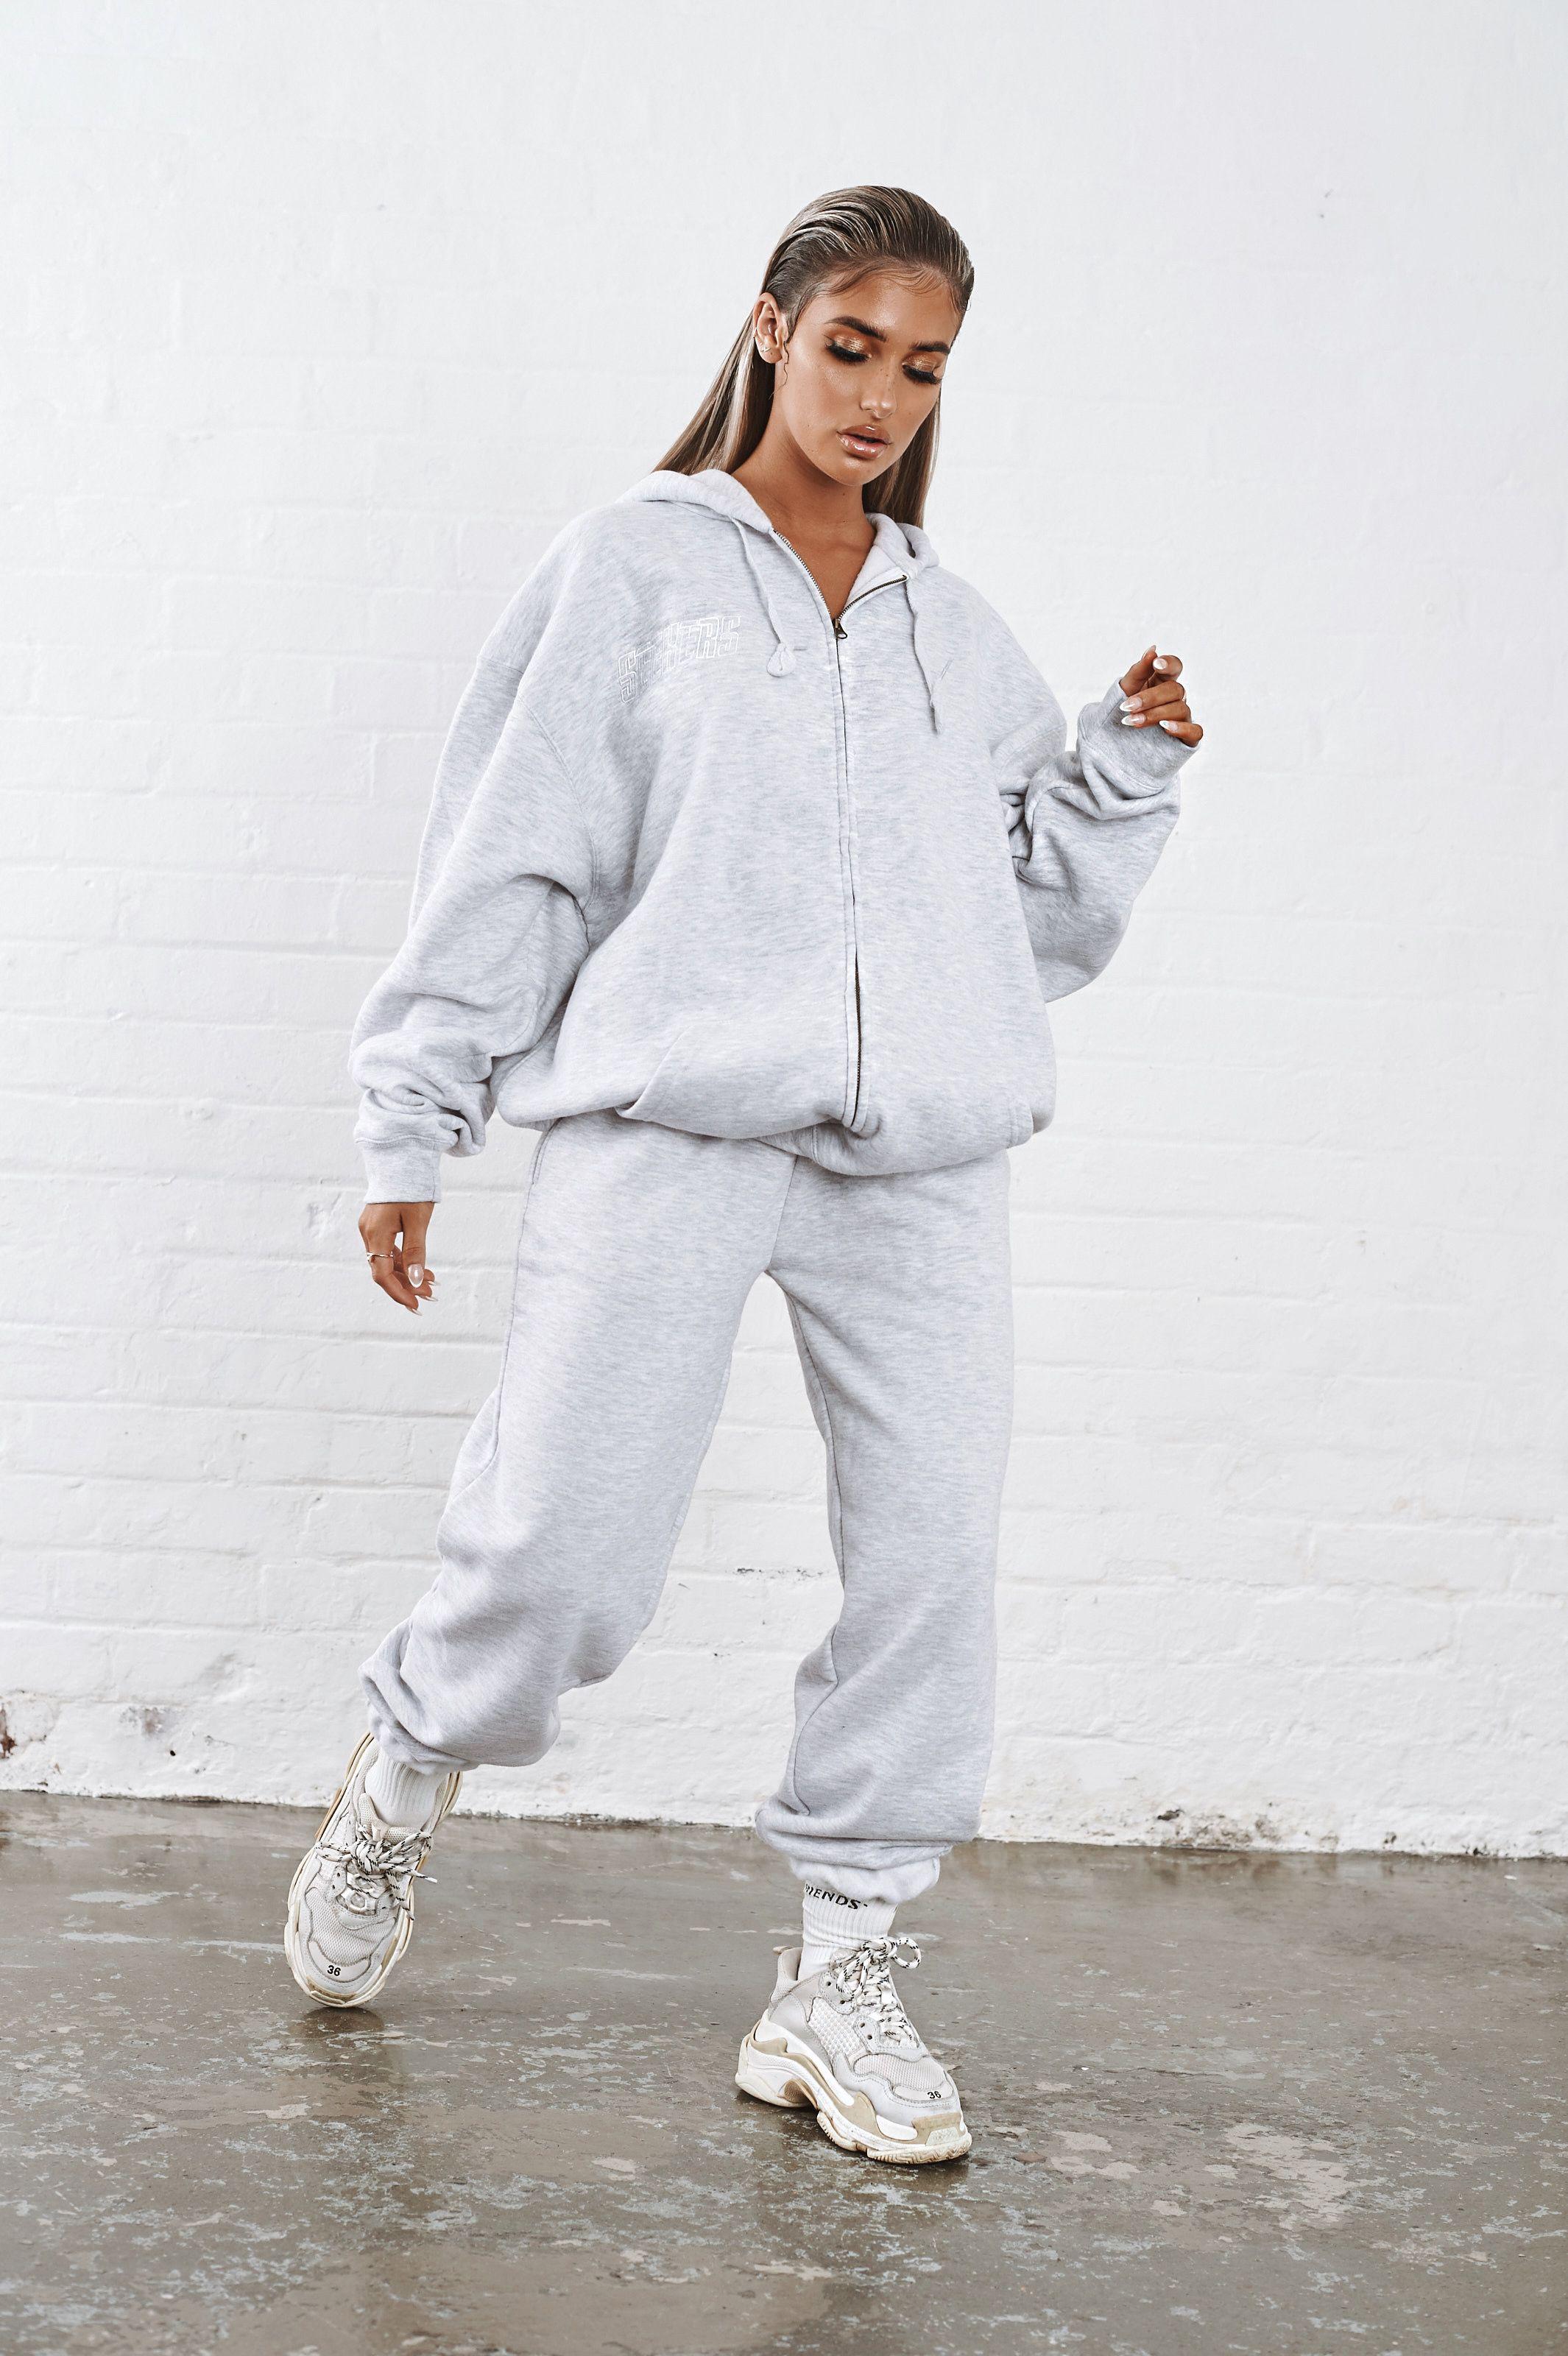 Effort Sweatpants 2 0 Gray Sweatpants Outfit Sweatpants Outfit Sweatpants